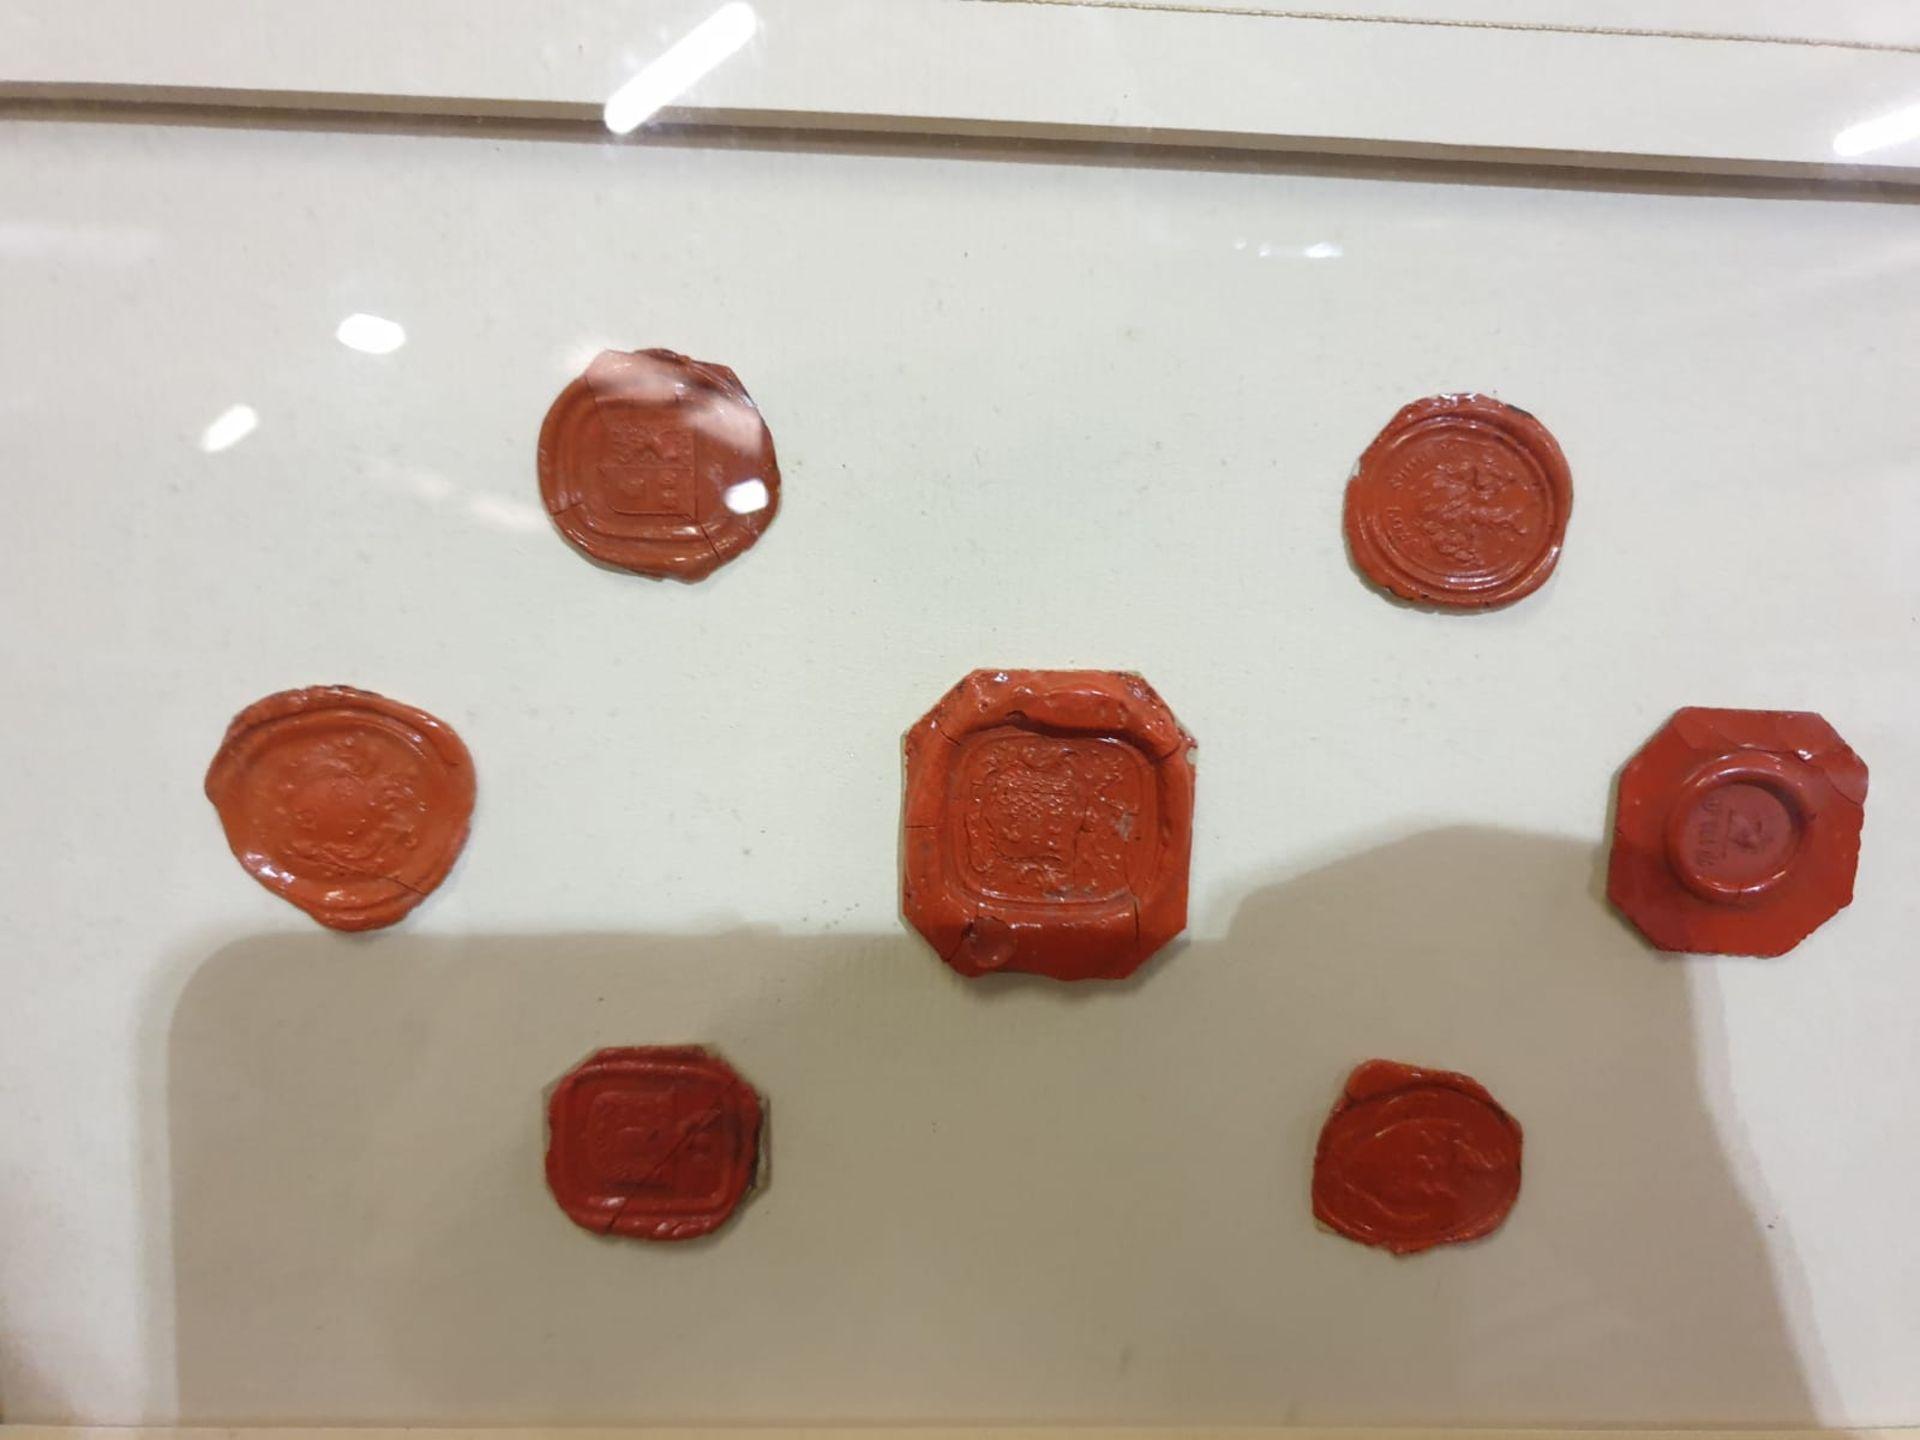 Framed artwork of wax Seals in Wood frame 42 x 32cm - Image 4 of 4